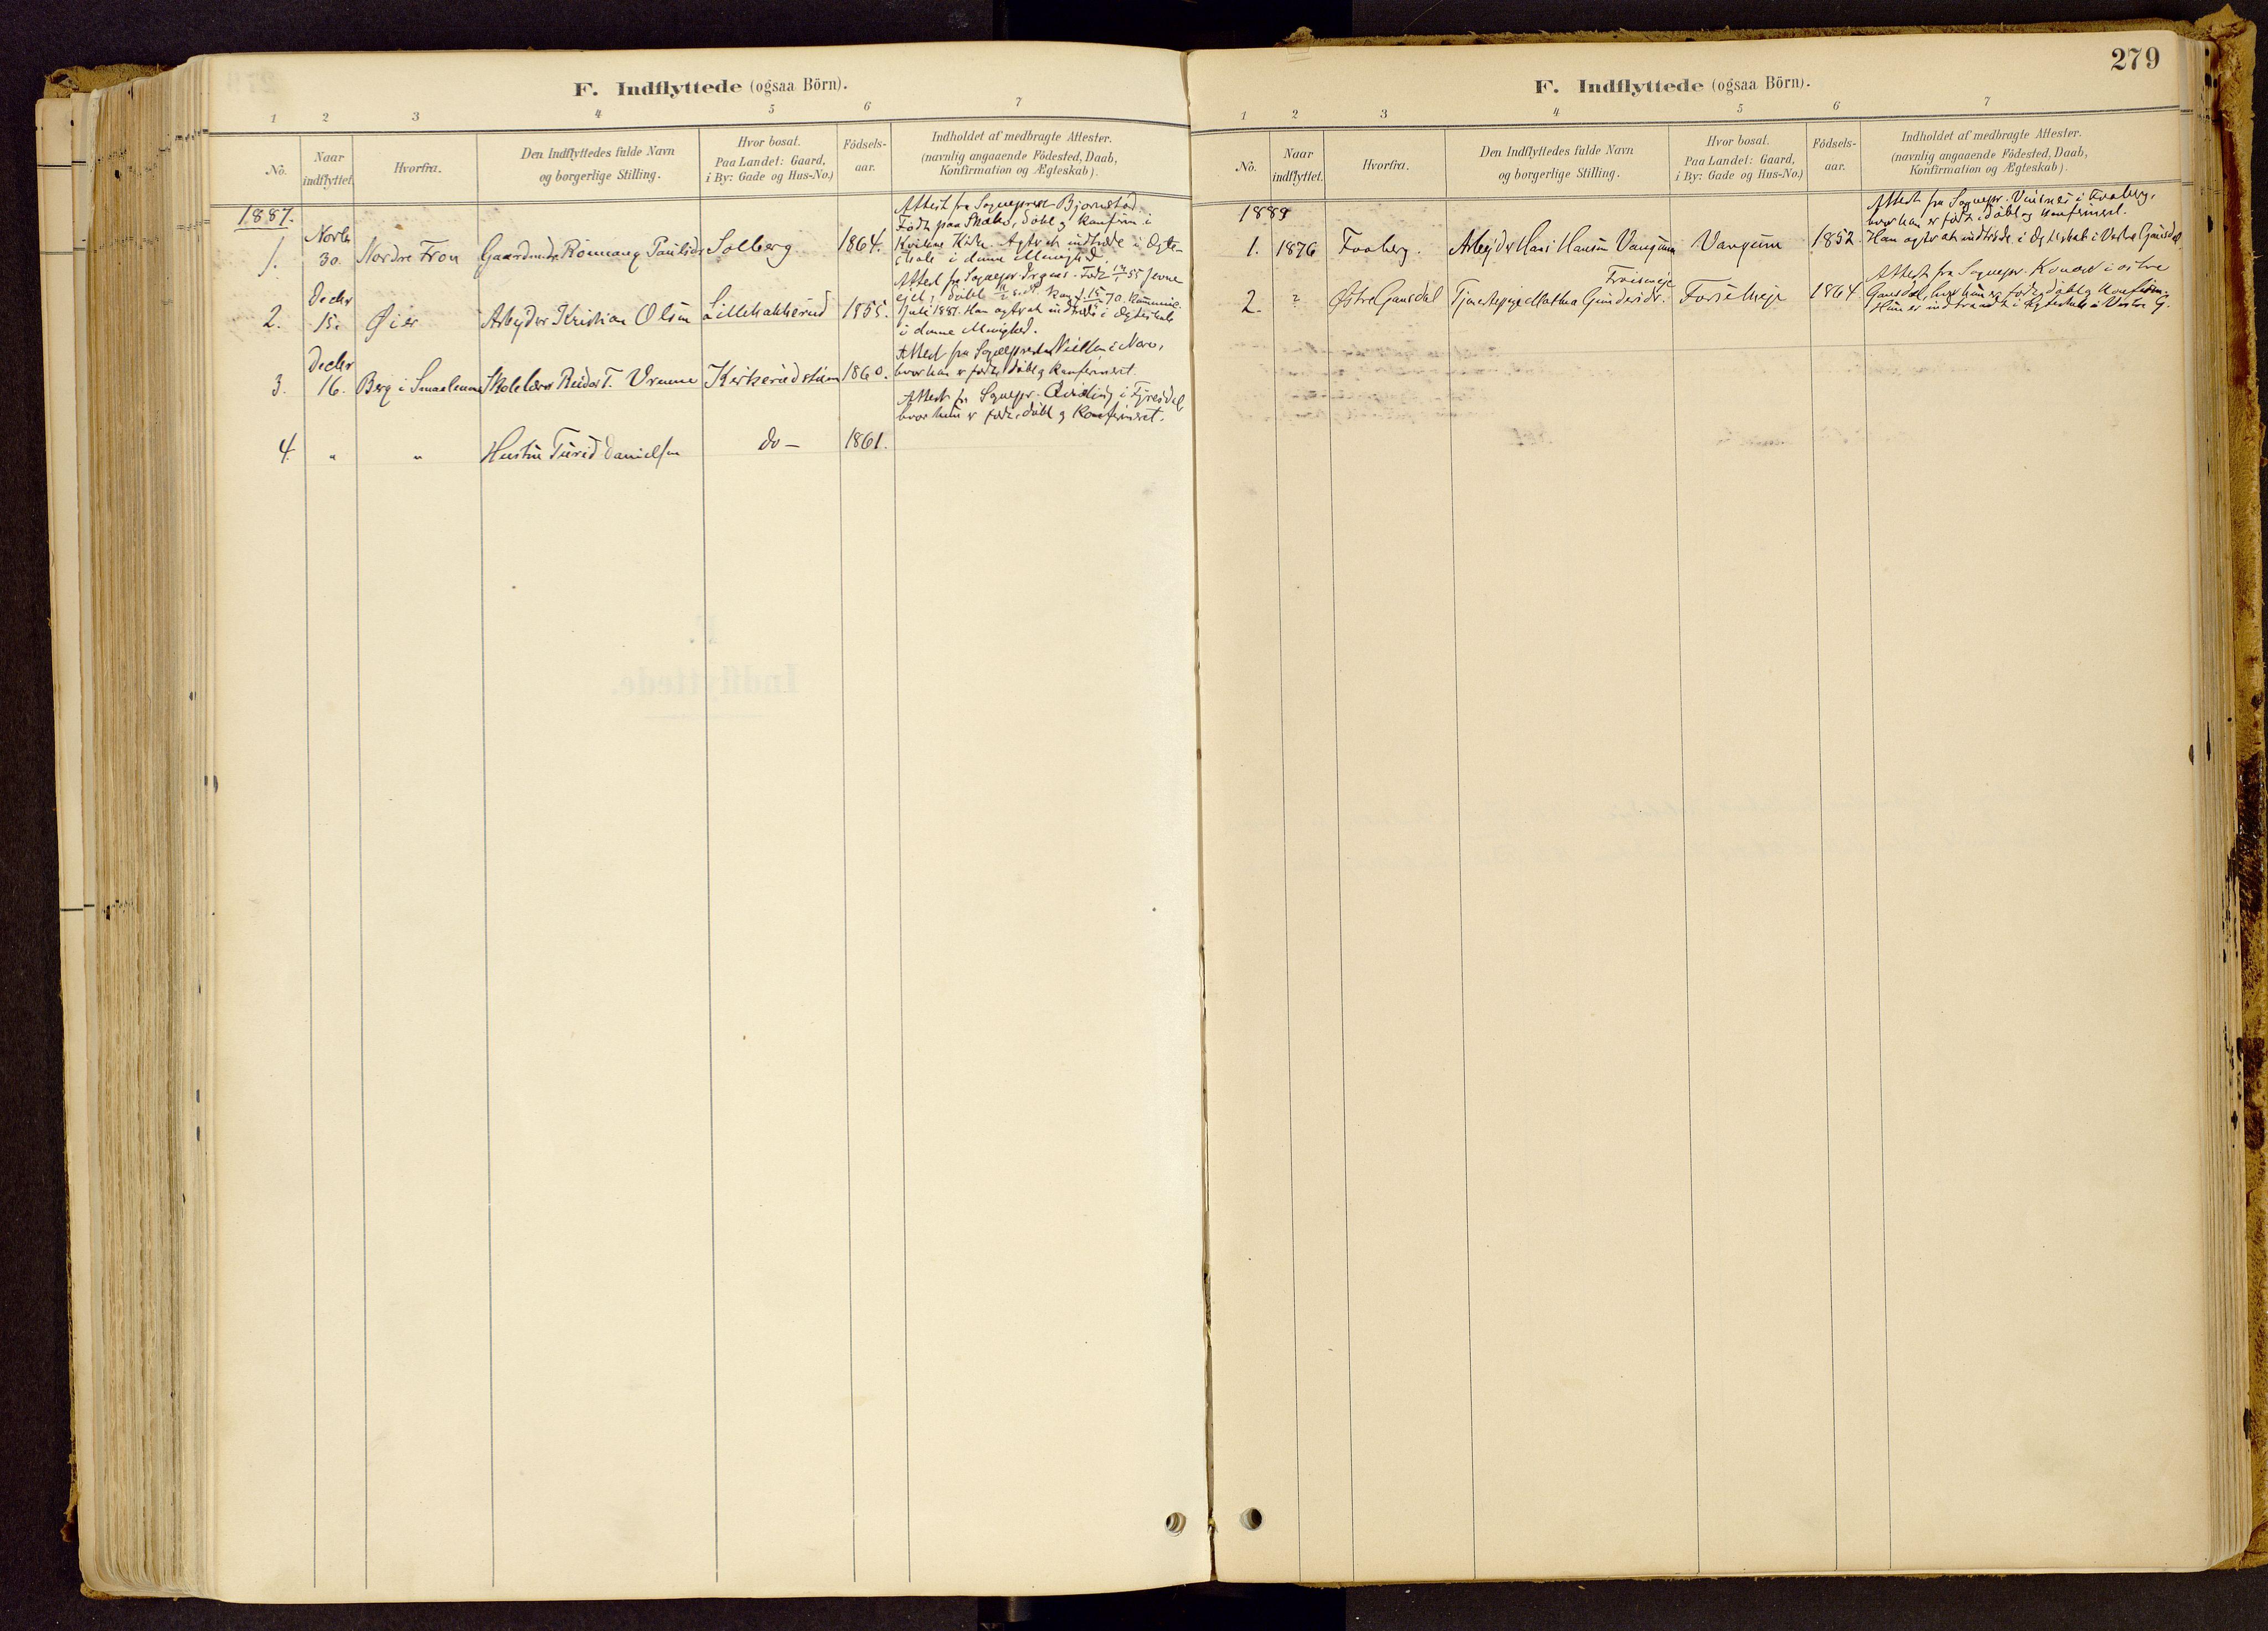 SAH, Vestre Gausdal prestekontor, Ministerialbok nr. 1, 1887-1914, s. 279